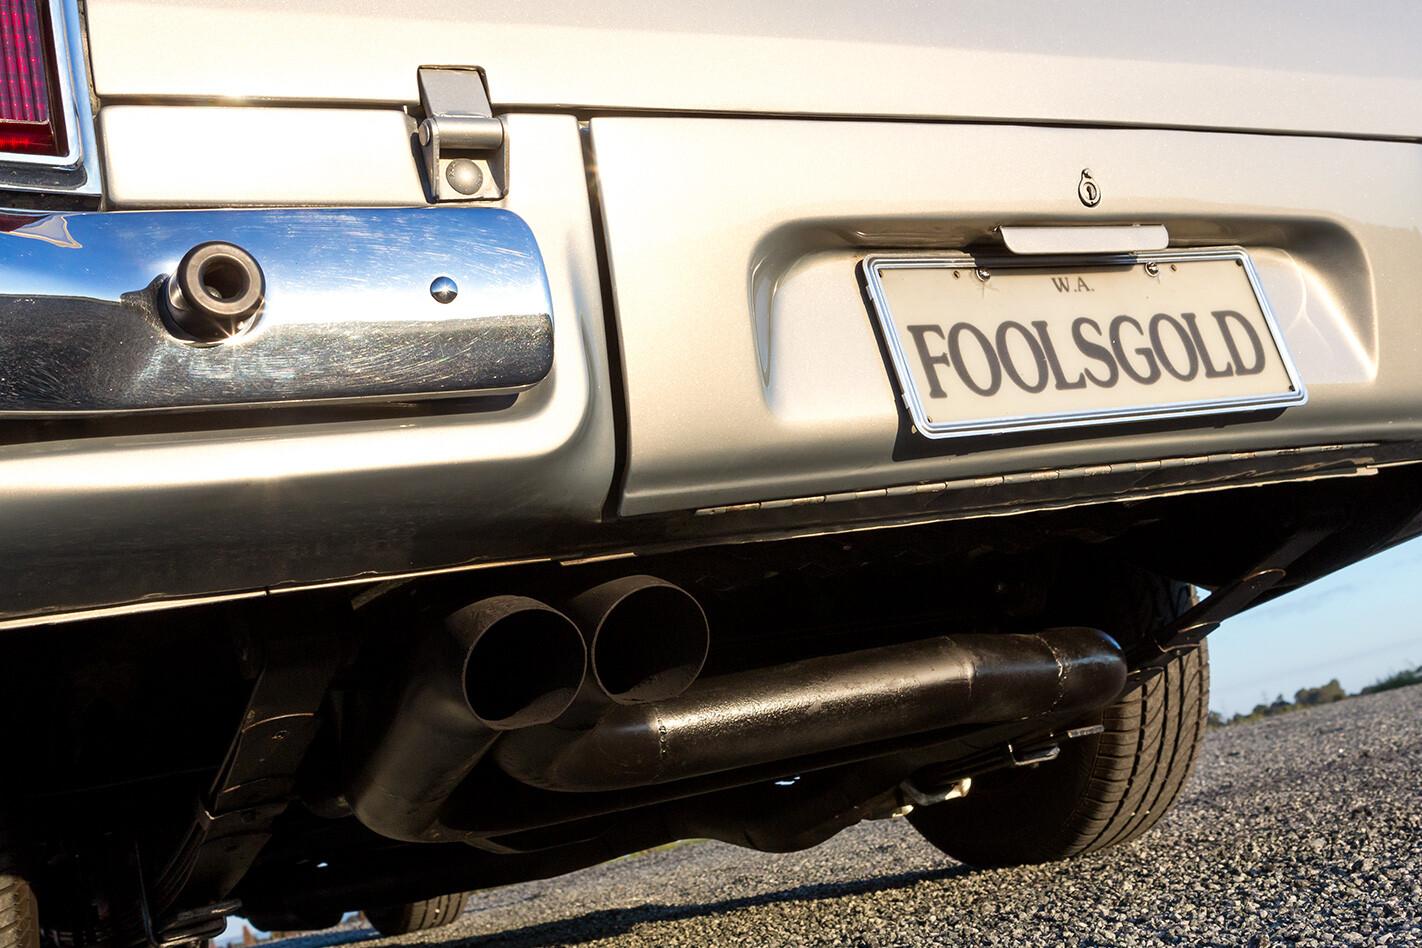 Shane-Willmott-FOOLSGOLD-1JZ-Holden-HT-Ute-Sleeper-rear-licence-plate